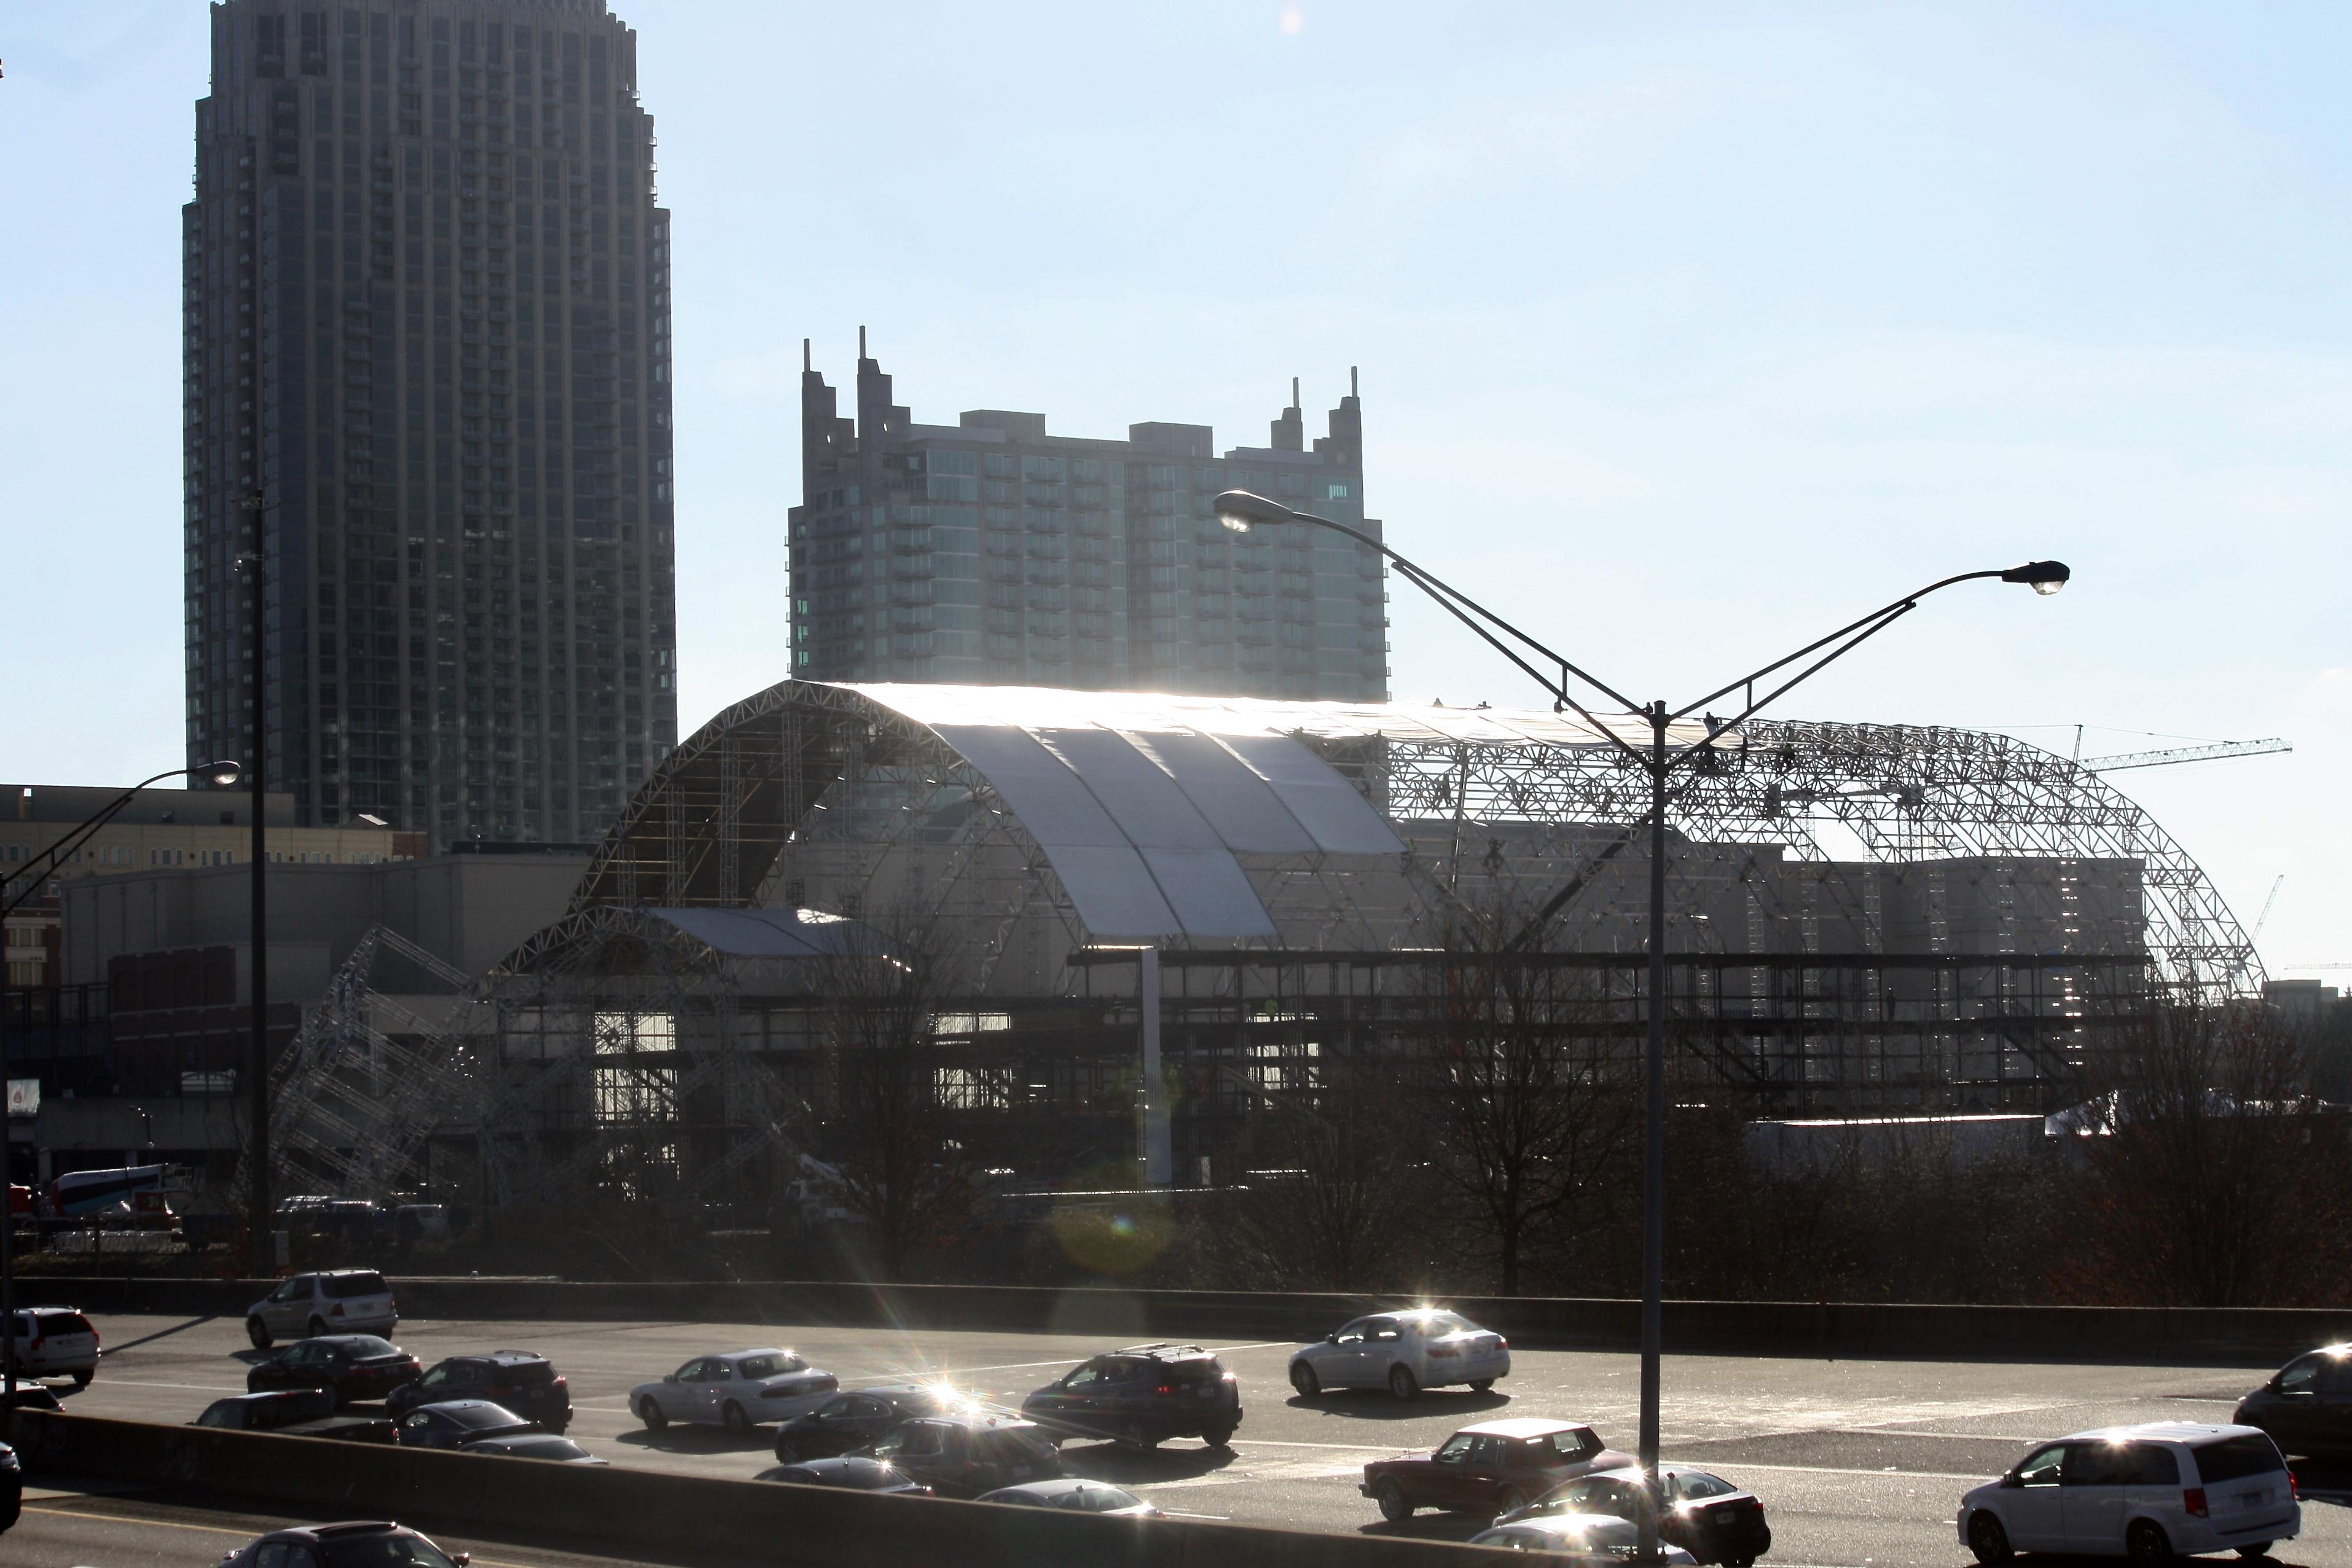 Photos: Massive venue for Super Bowl LIII concert is rising